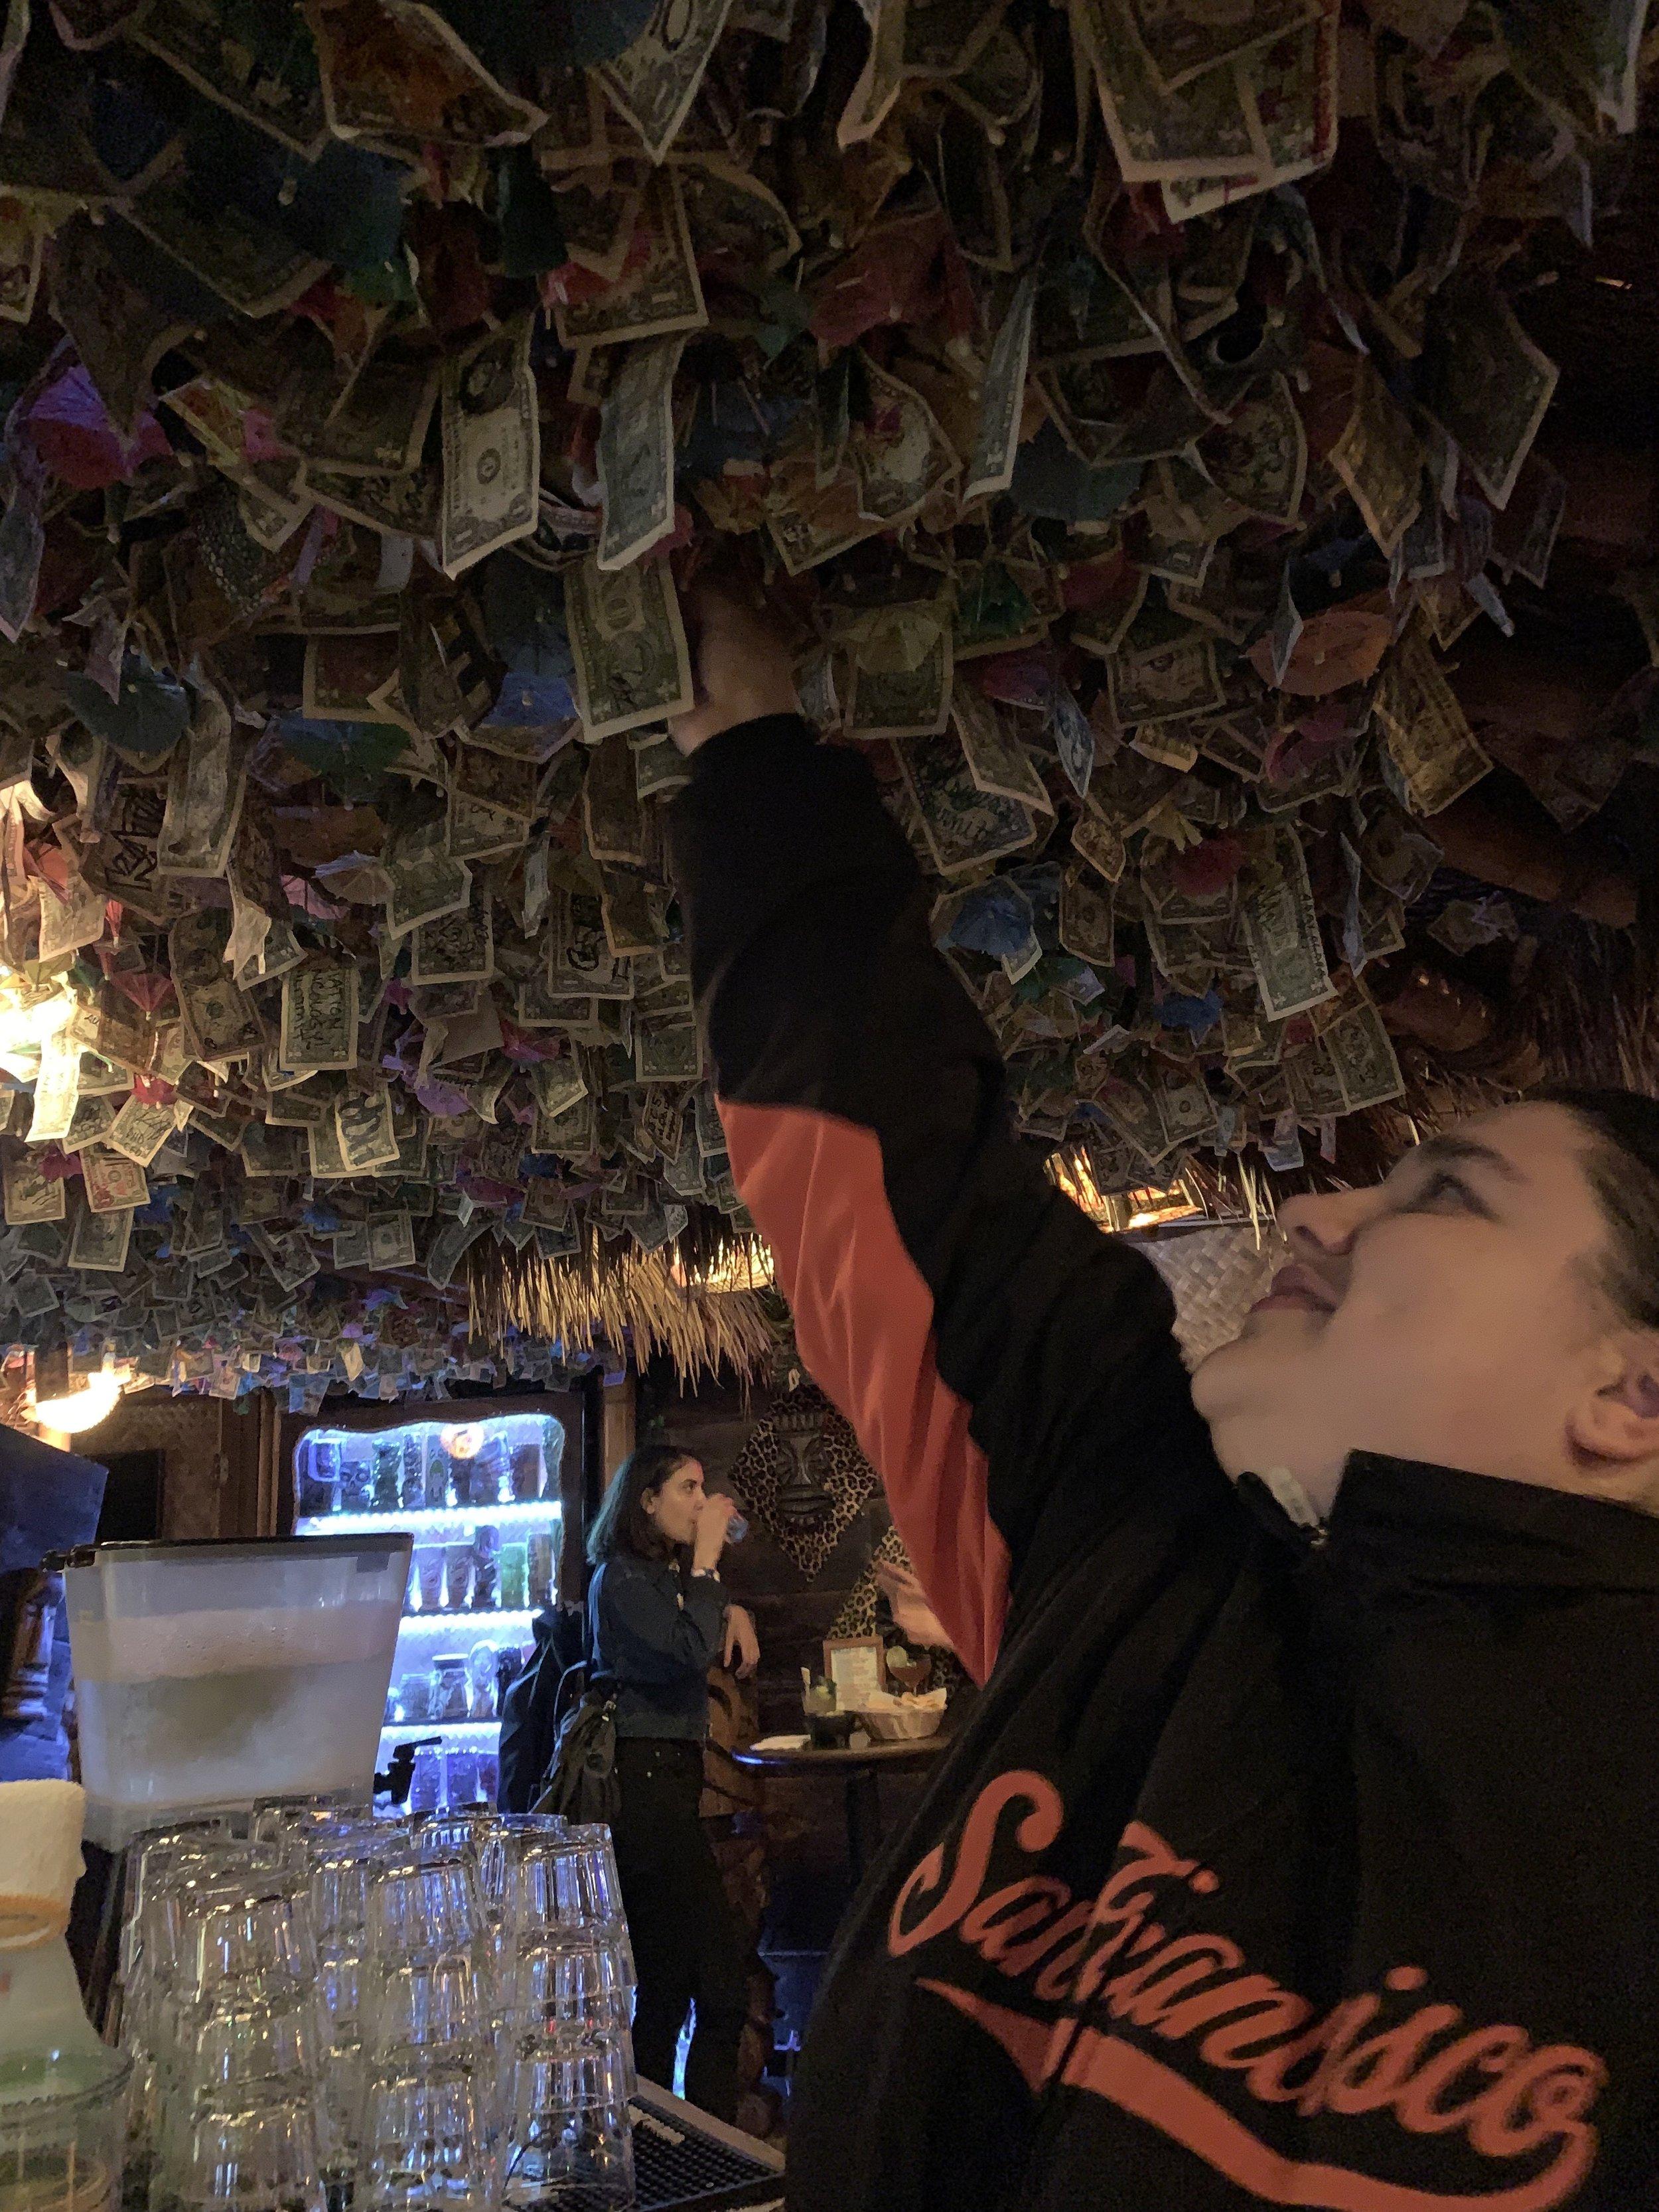 Nelly Stealing Money - JK!